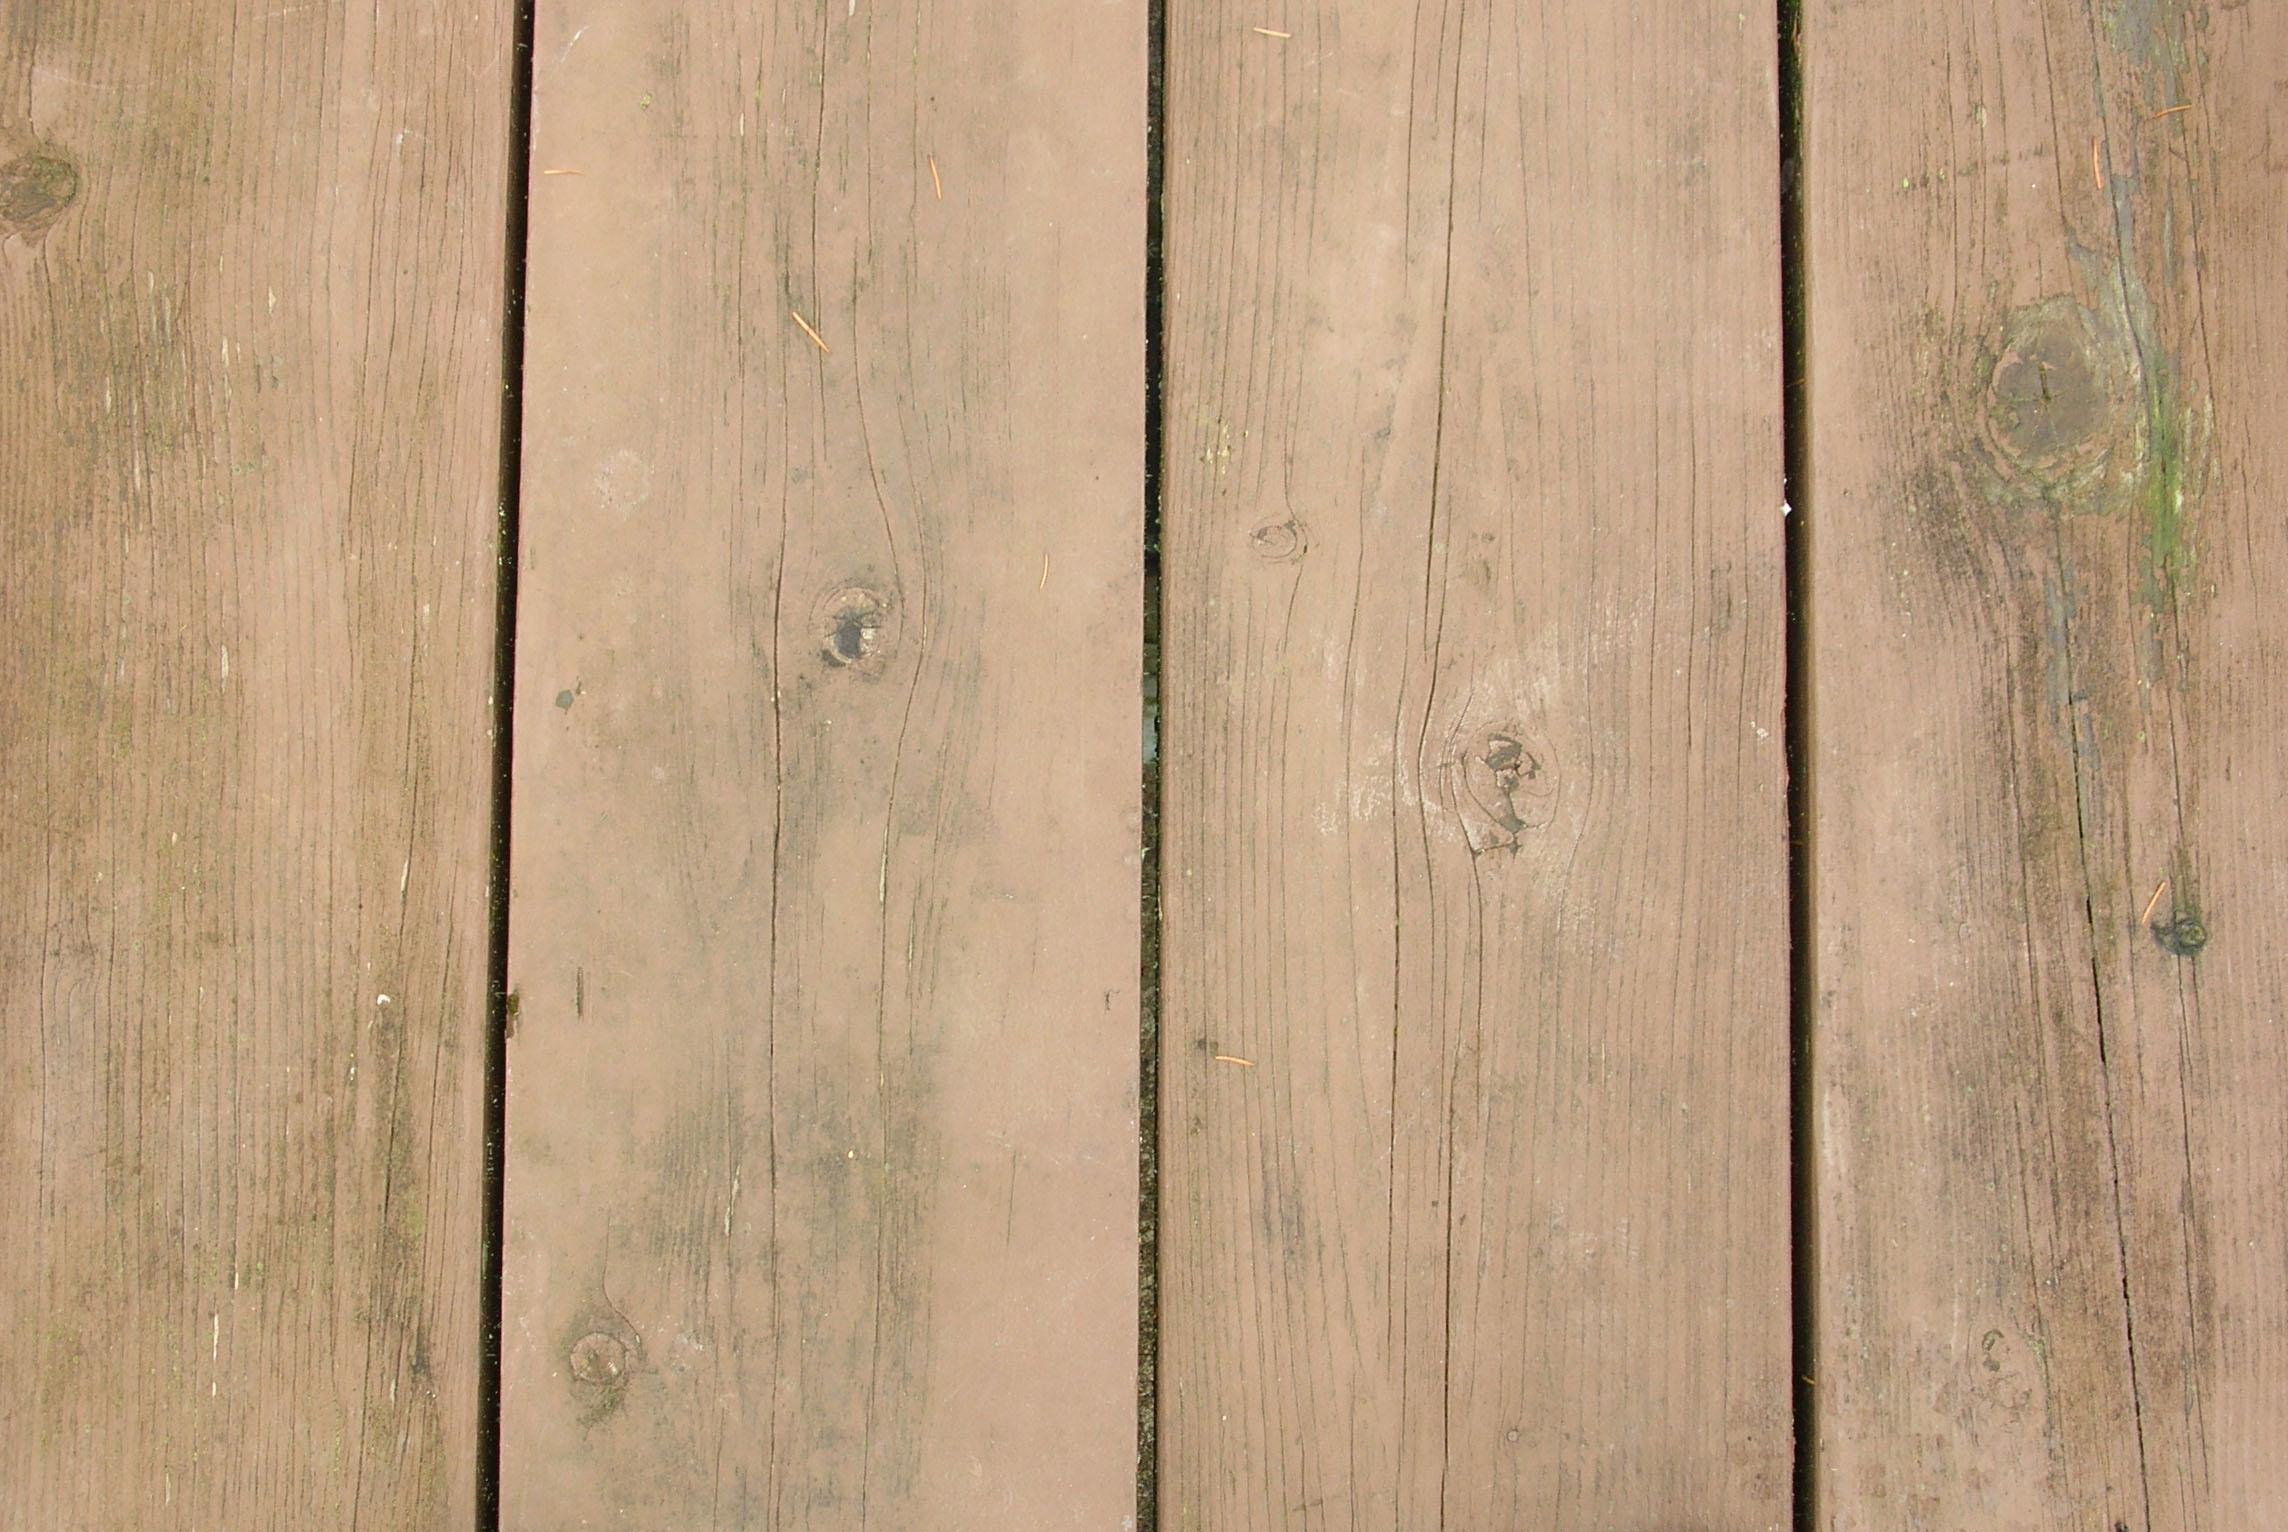 Cool hd wood wallpaper download free wallpapers and desktop - Wood Wallpaper Plain Hd Desktop Wallpapers 4k Hd